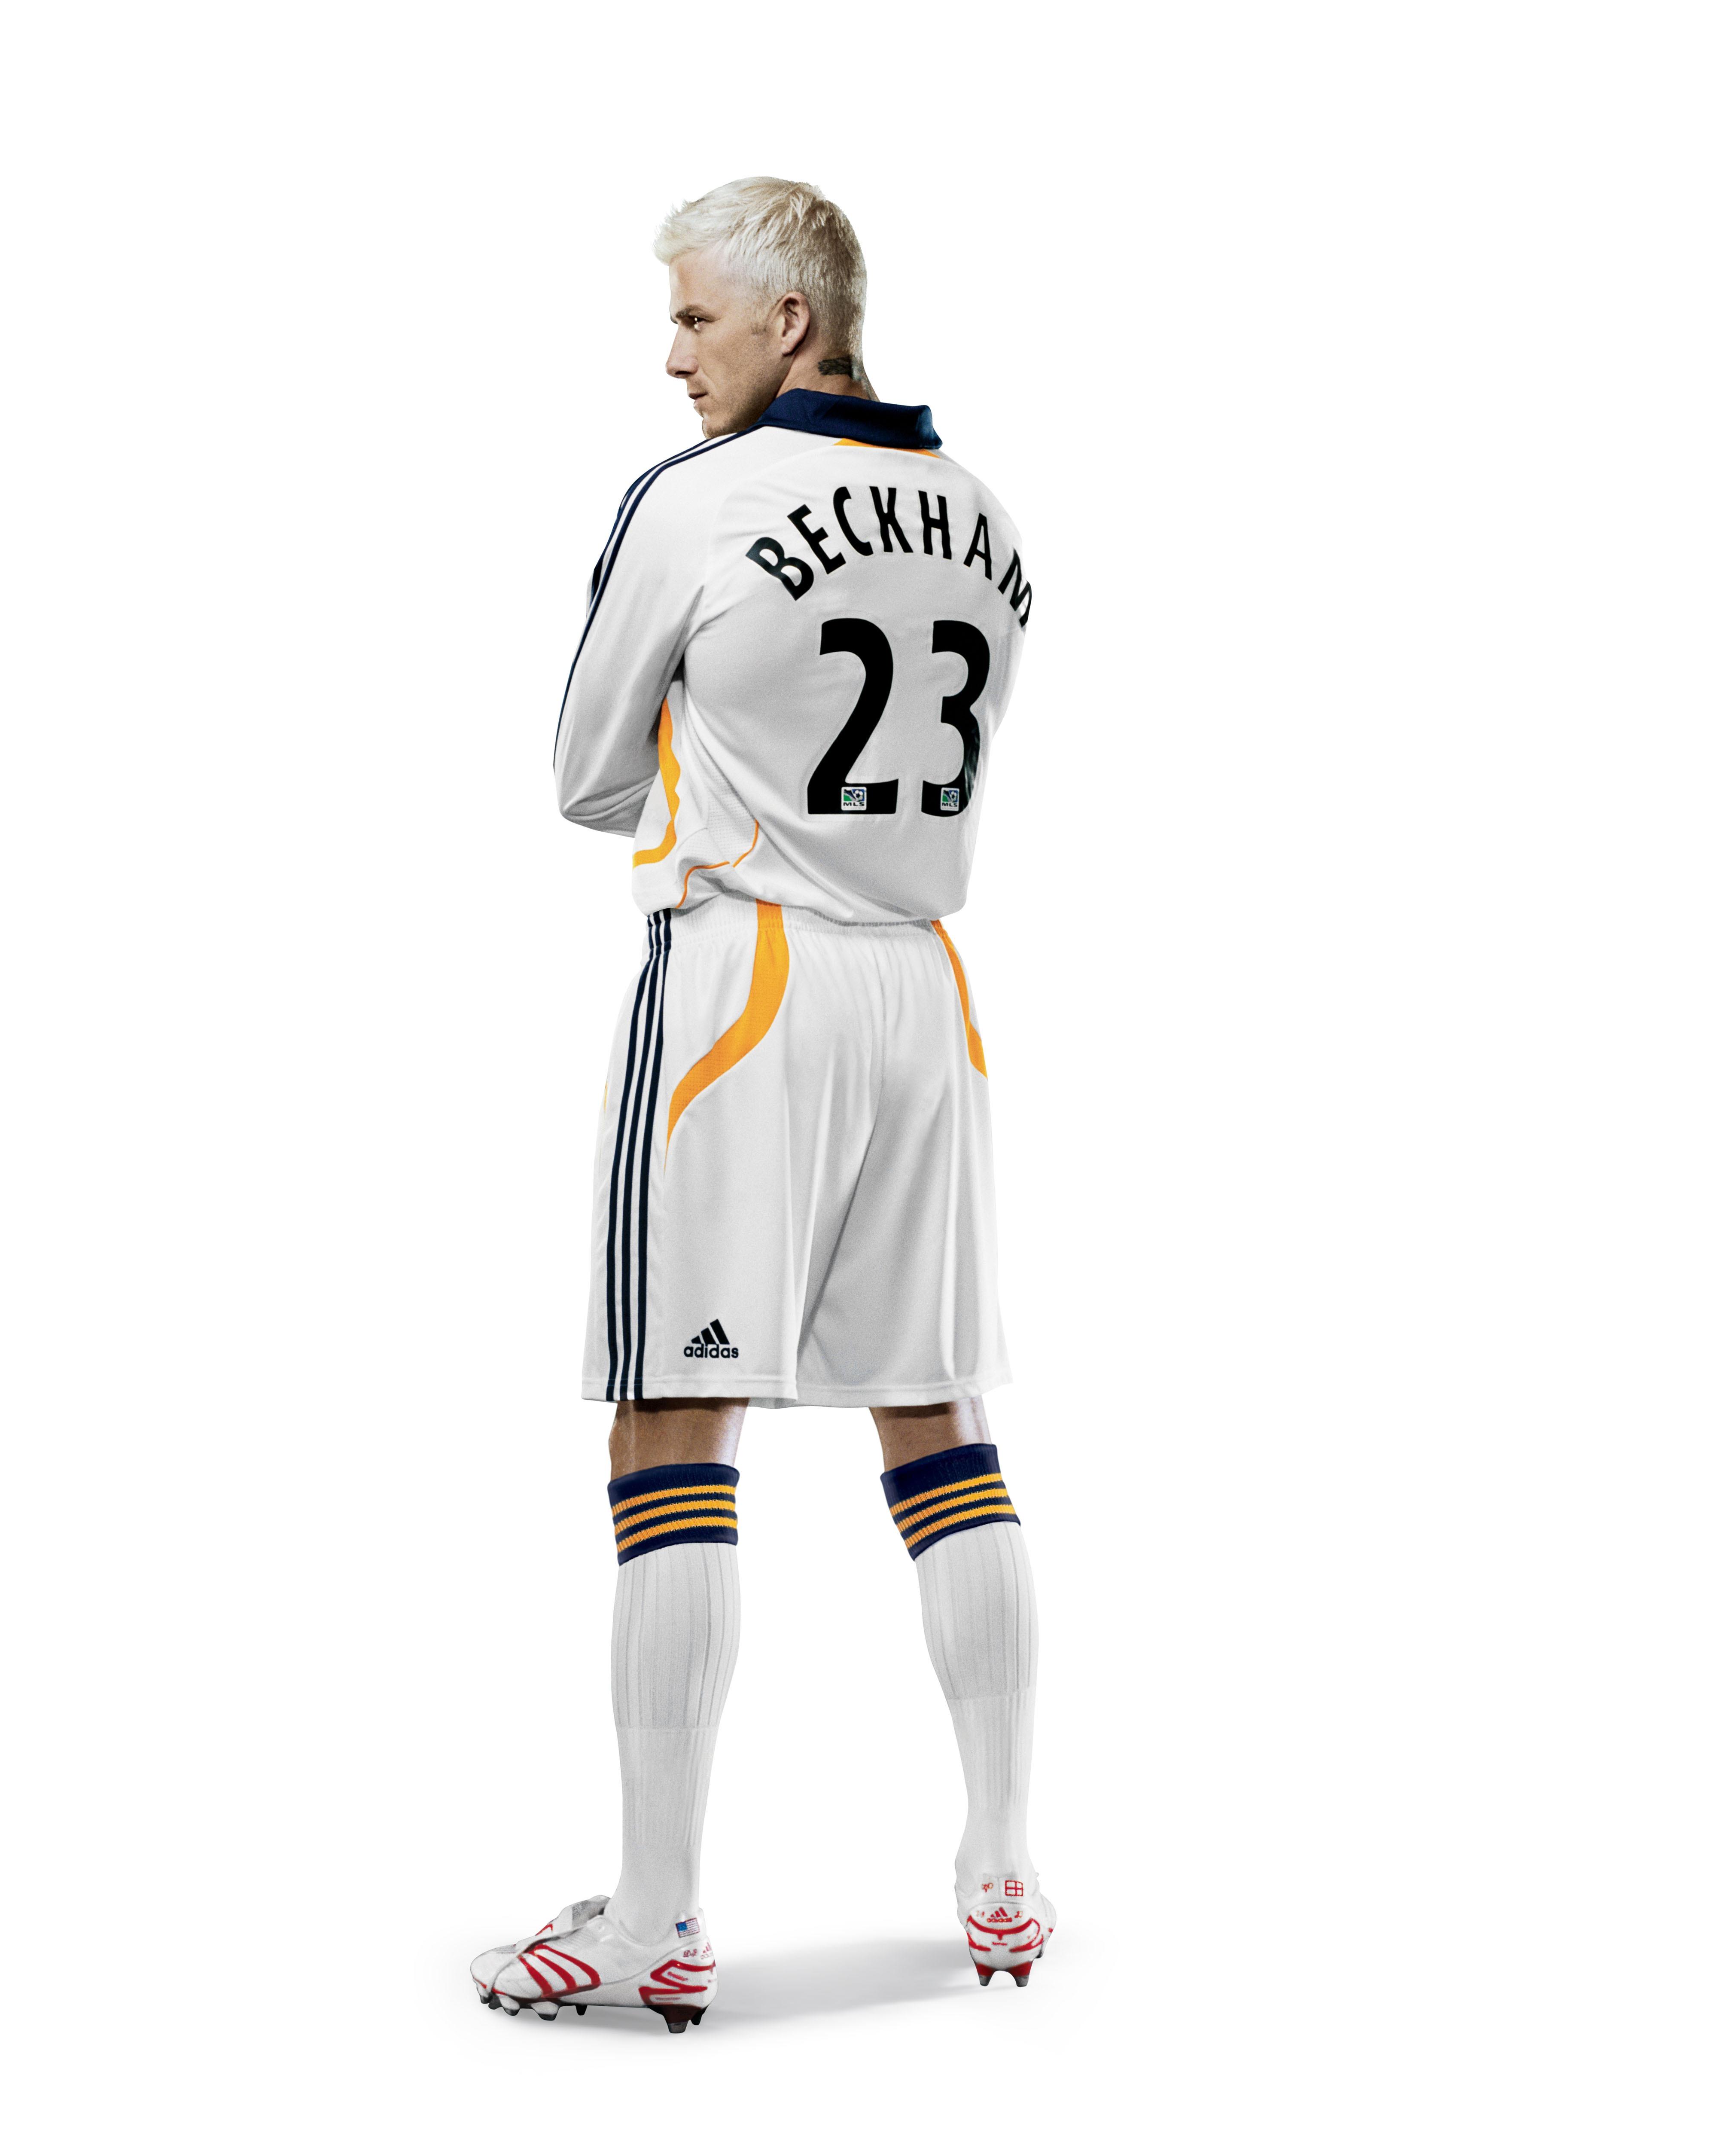 The Snapshot Special David Beckham S New Adidas La Galaxy